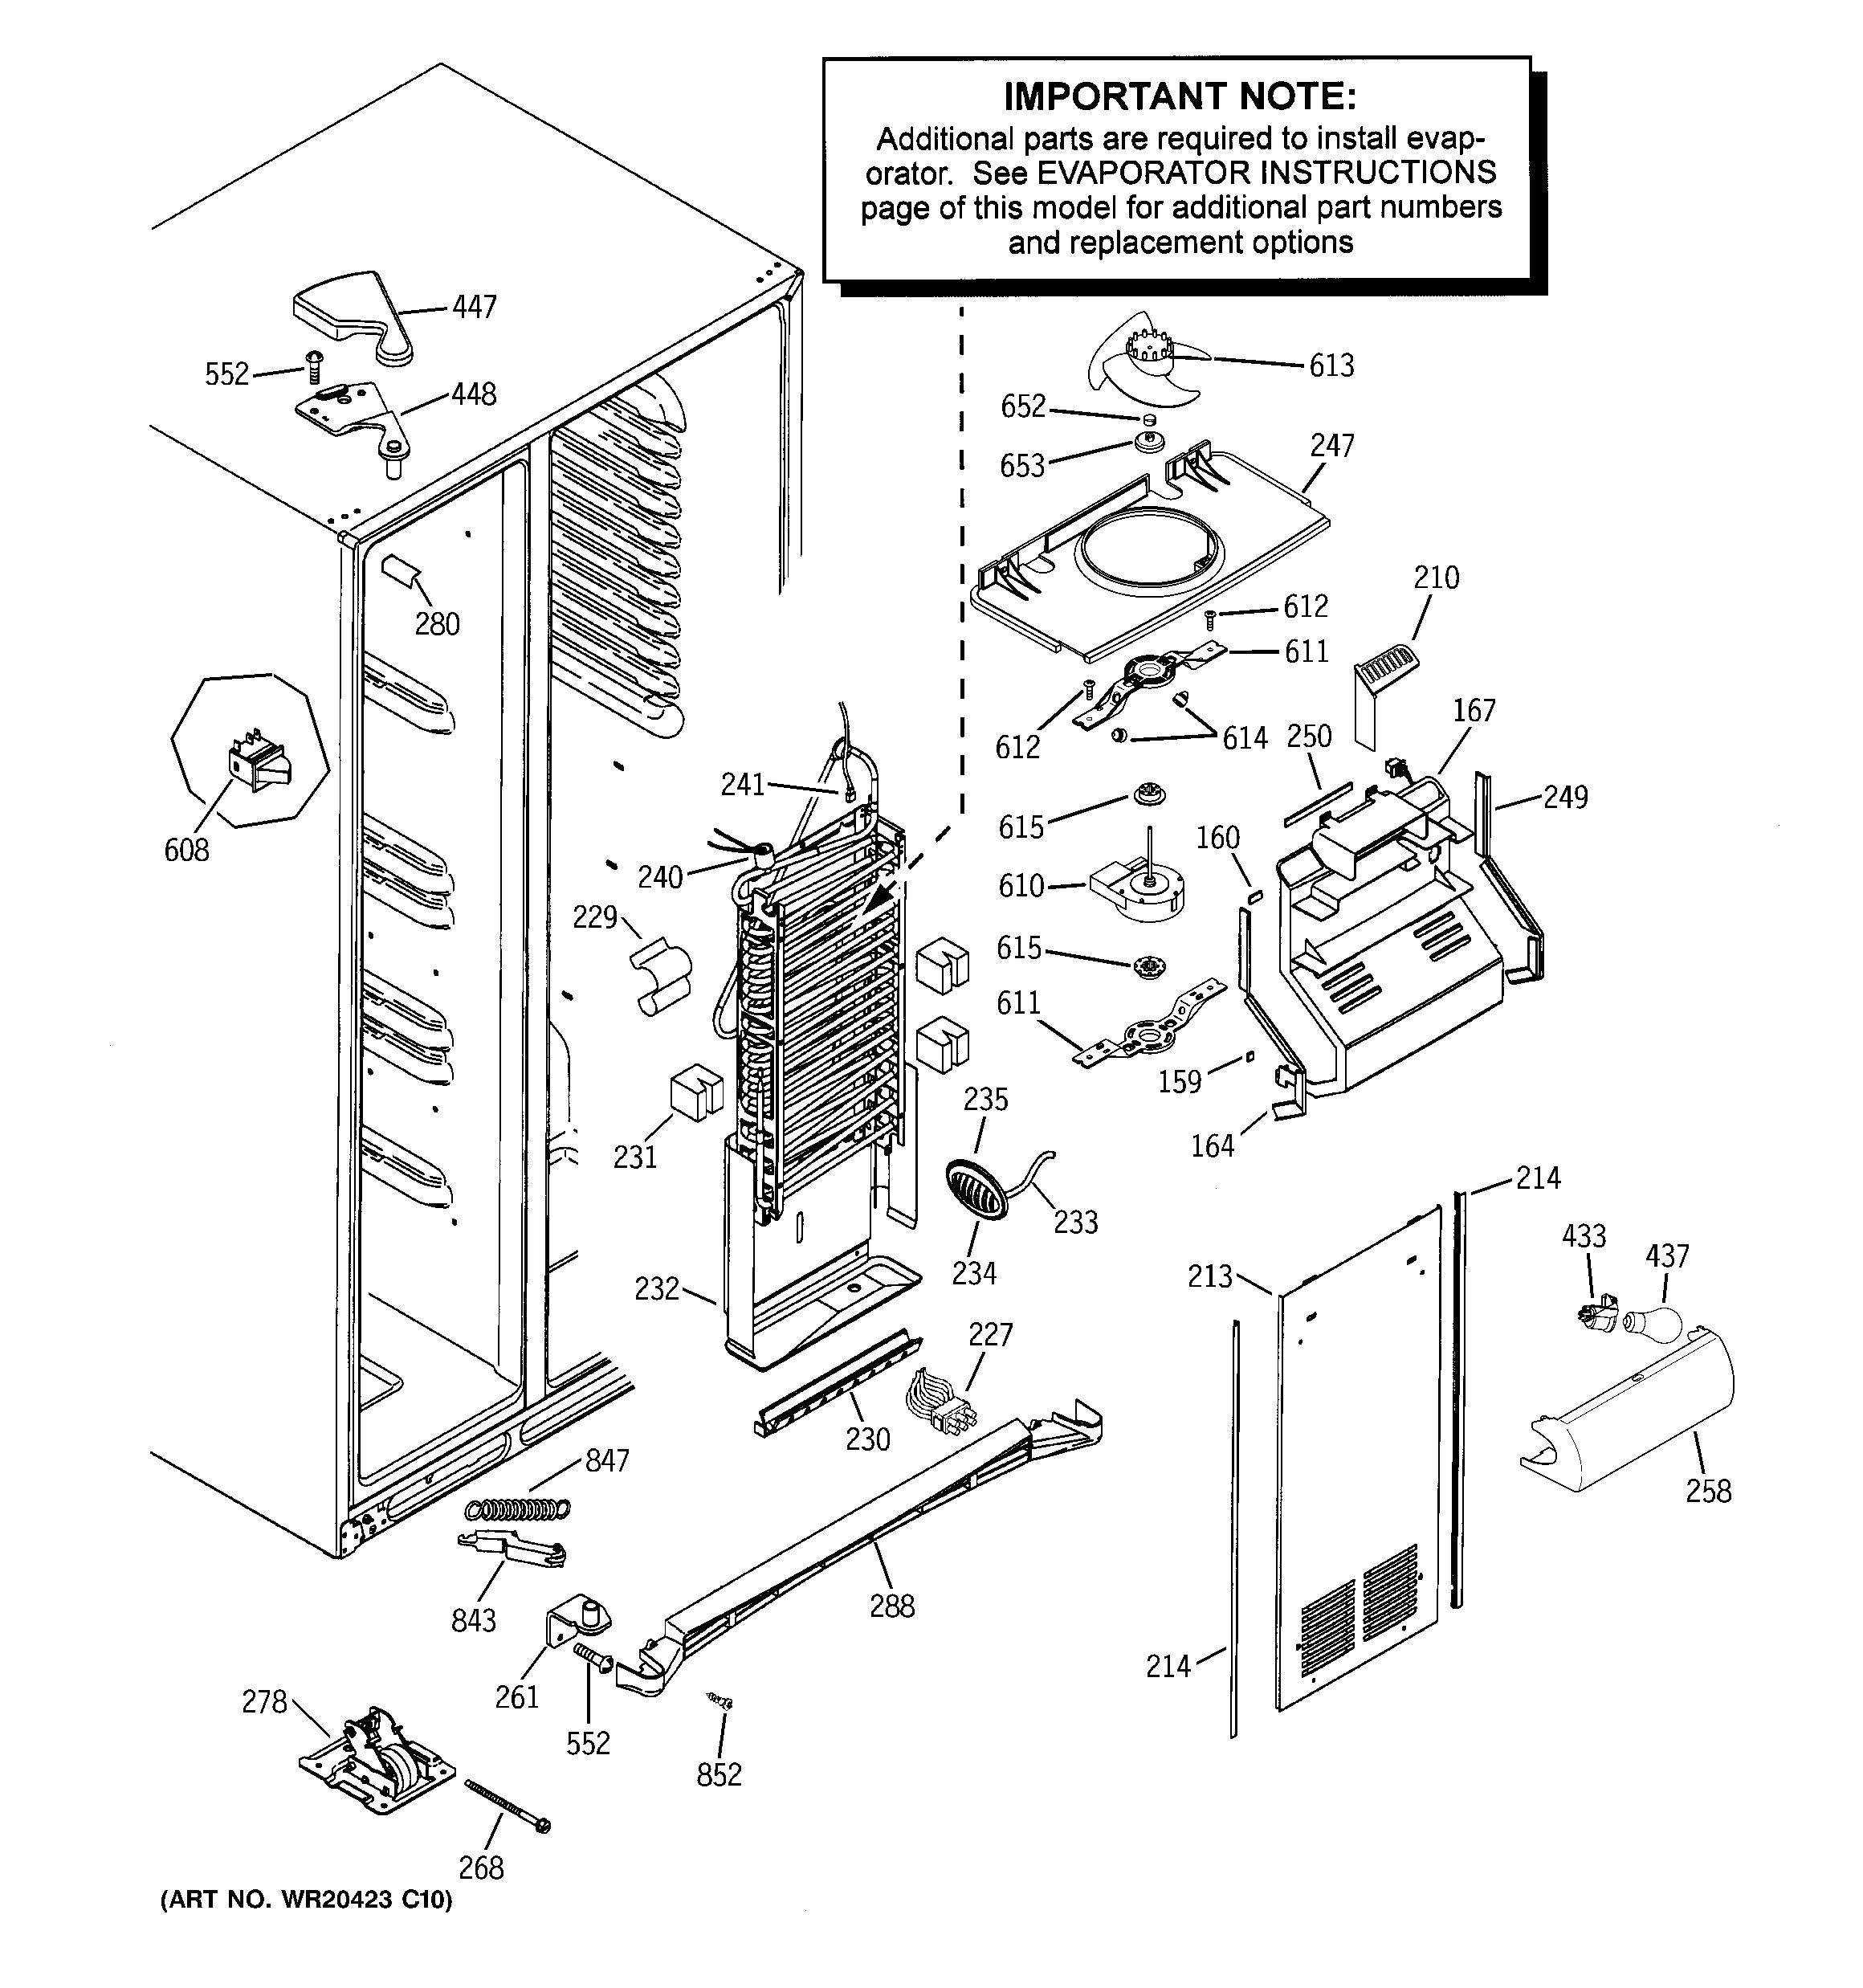 Ge Profile Schematic - Ford 5 0 Wiring Harness Standalone -  oonboard.bmw1992.warmi.fr | Ge Profile Eps22sbsbss Wiring Diagram |  | Wiring Diagram Resource